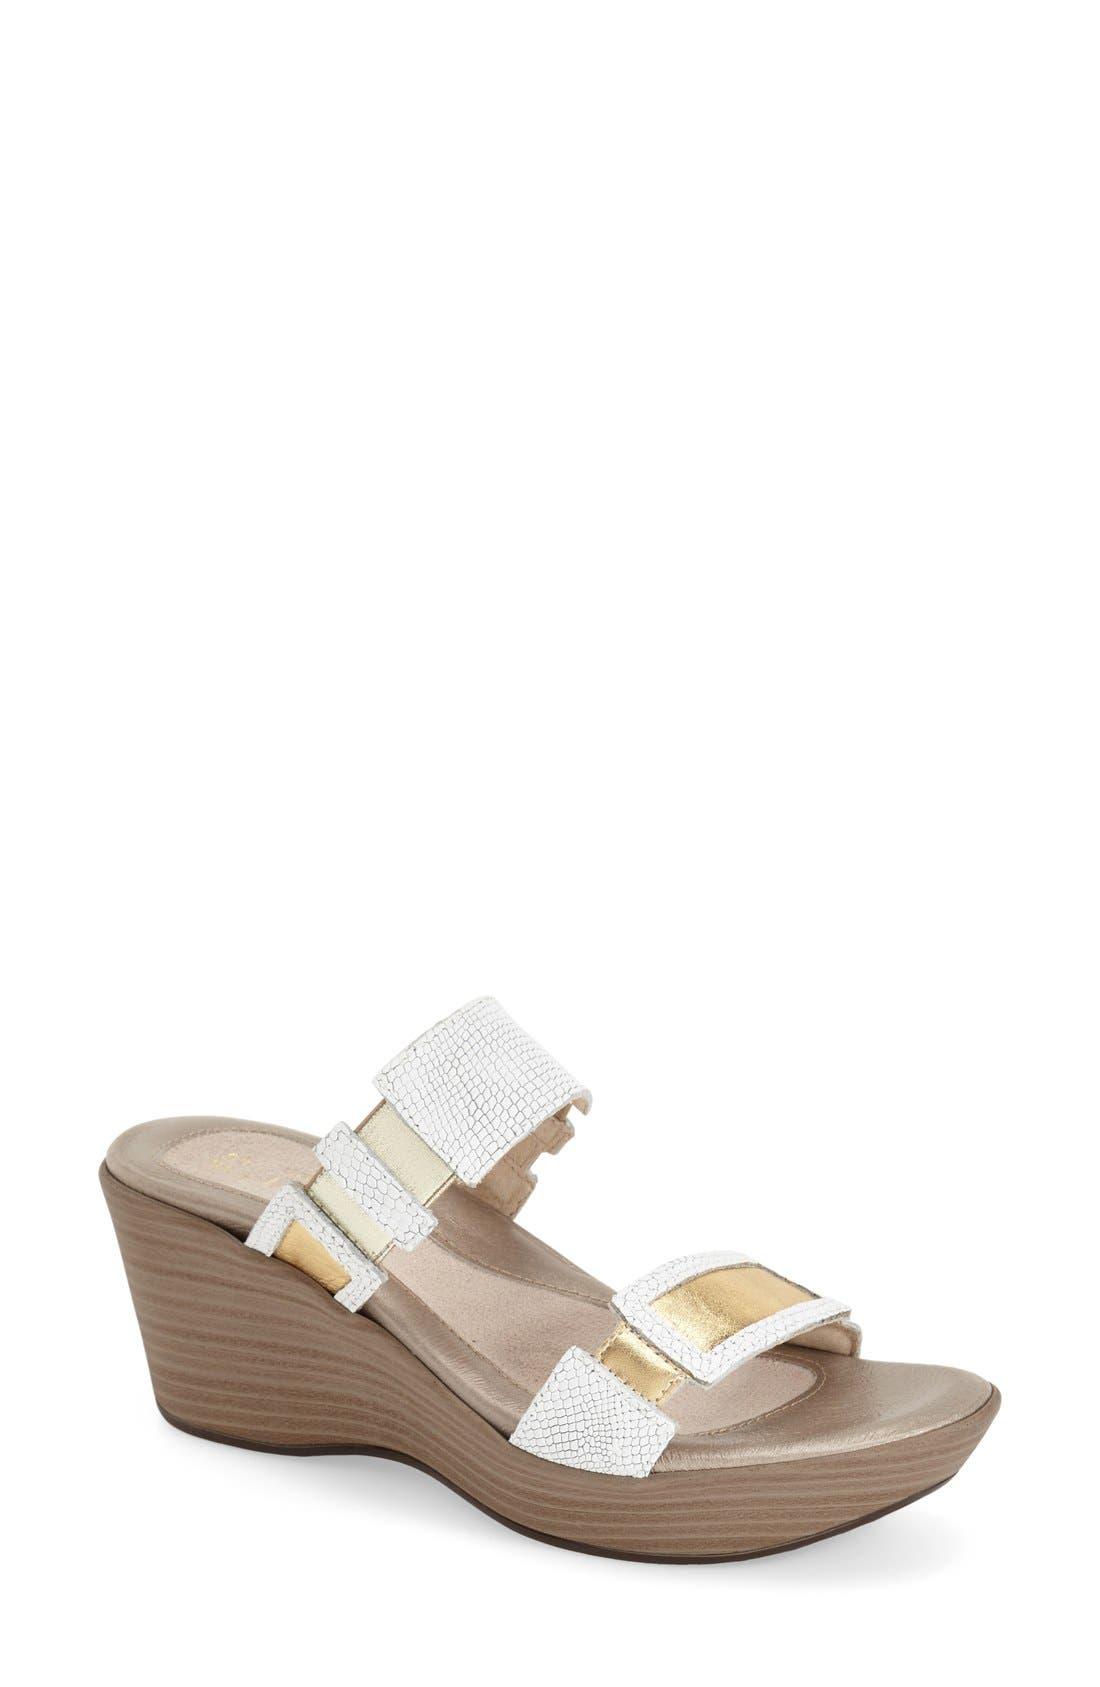 Main Image - Naot 'Treasure' Sandal